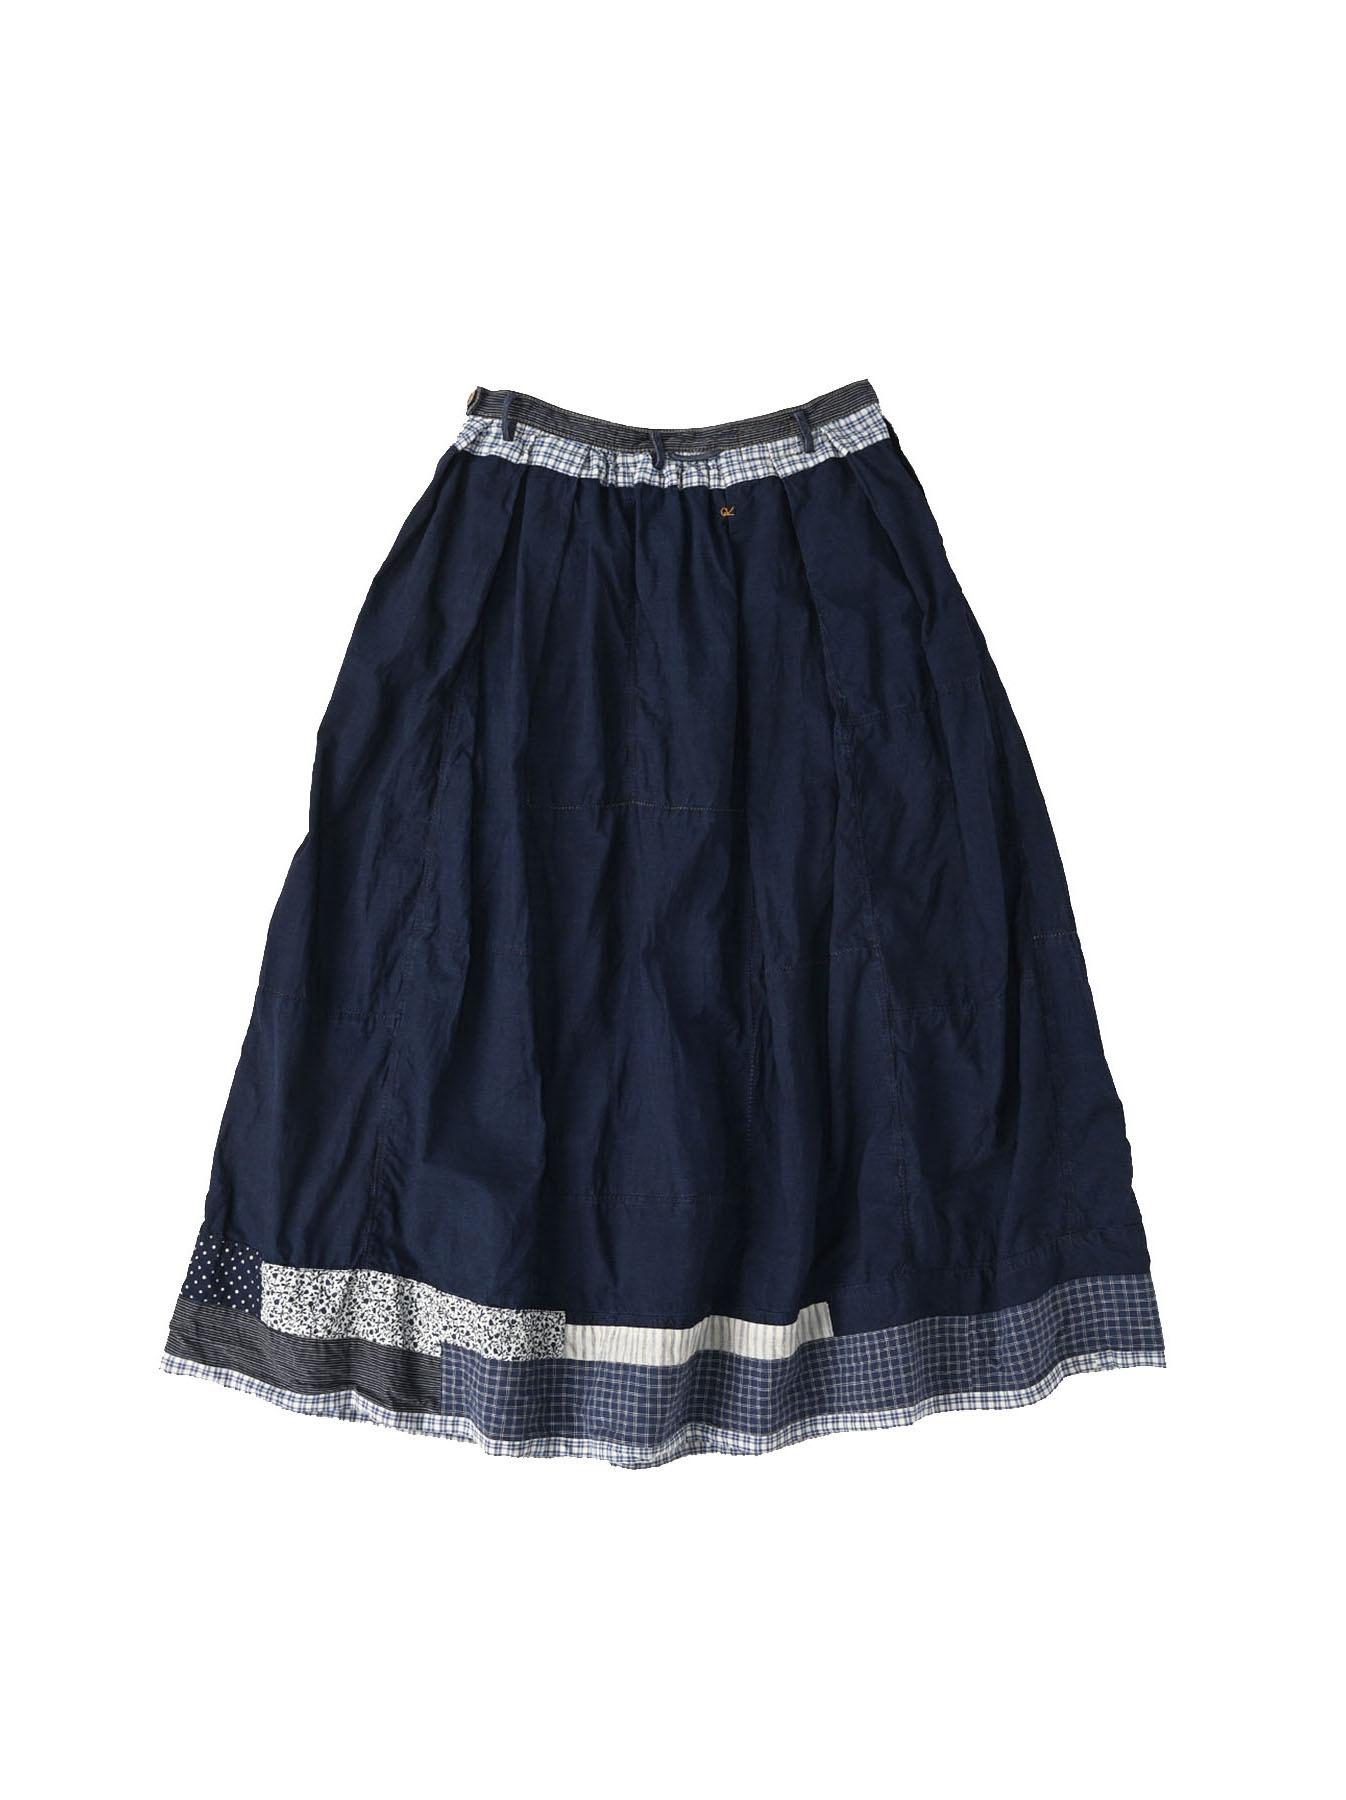 Indigo Tappet Patchwork Skirt-10